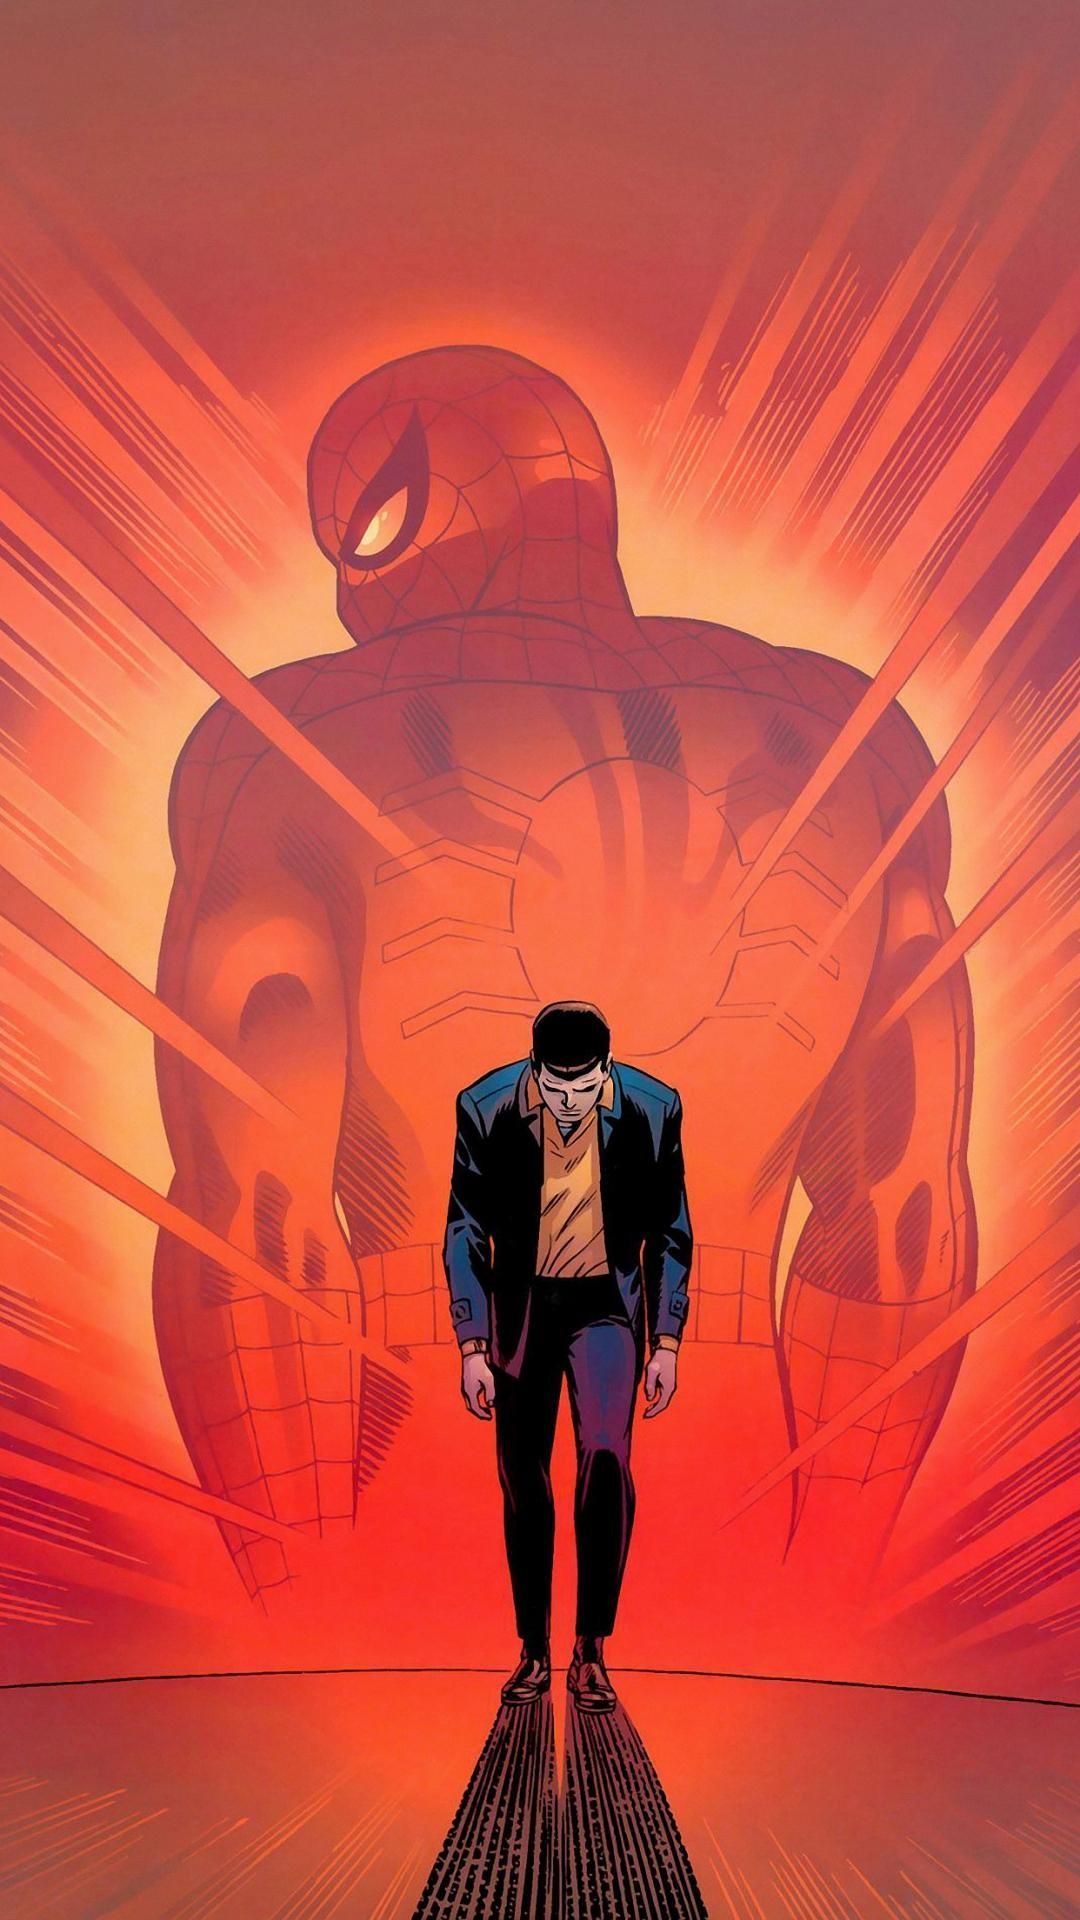 wallpaper.wiki-Spiderman-Cartoon-Wallpaper-for-Iphone-PIC-